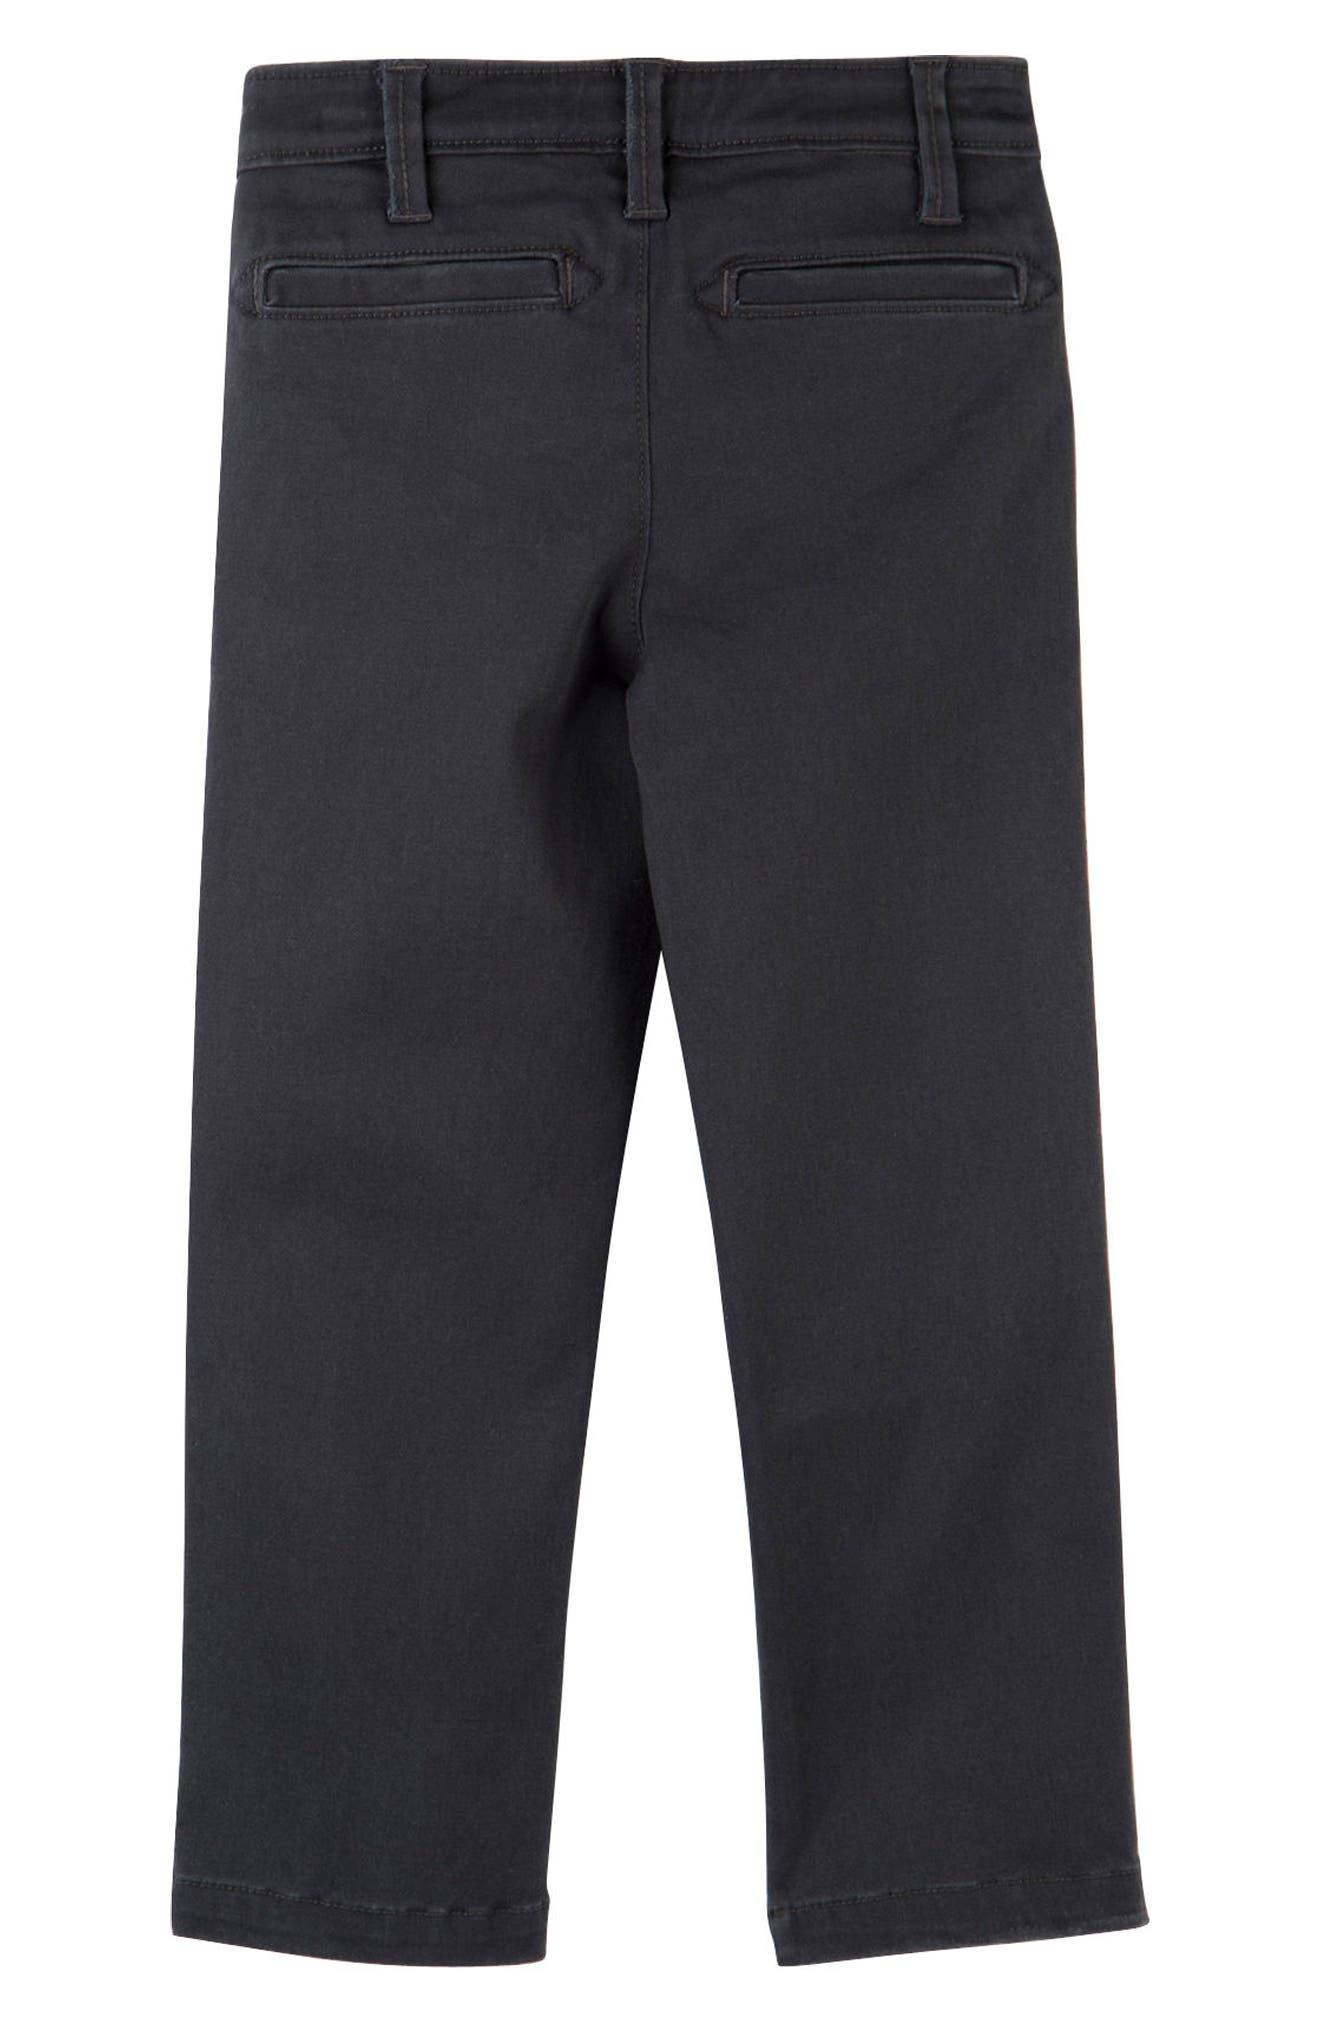 HATLEY, Stretch Cotton Twill Pants, Alternate thumbnail 2, color, 020